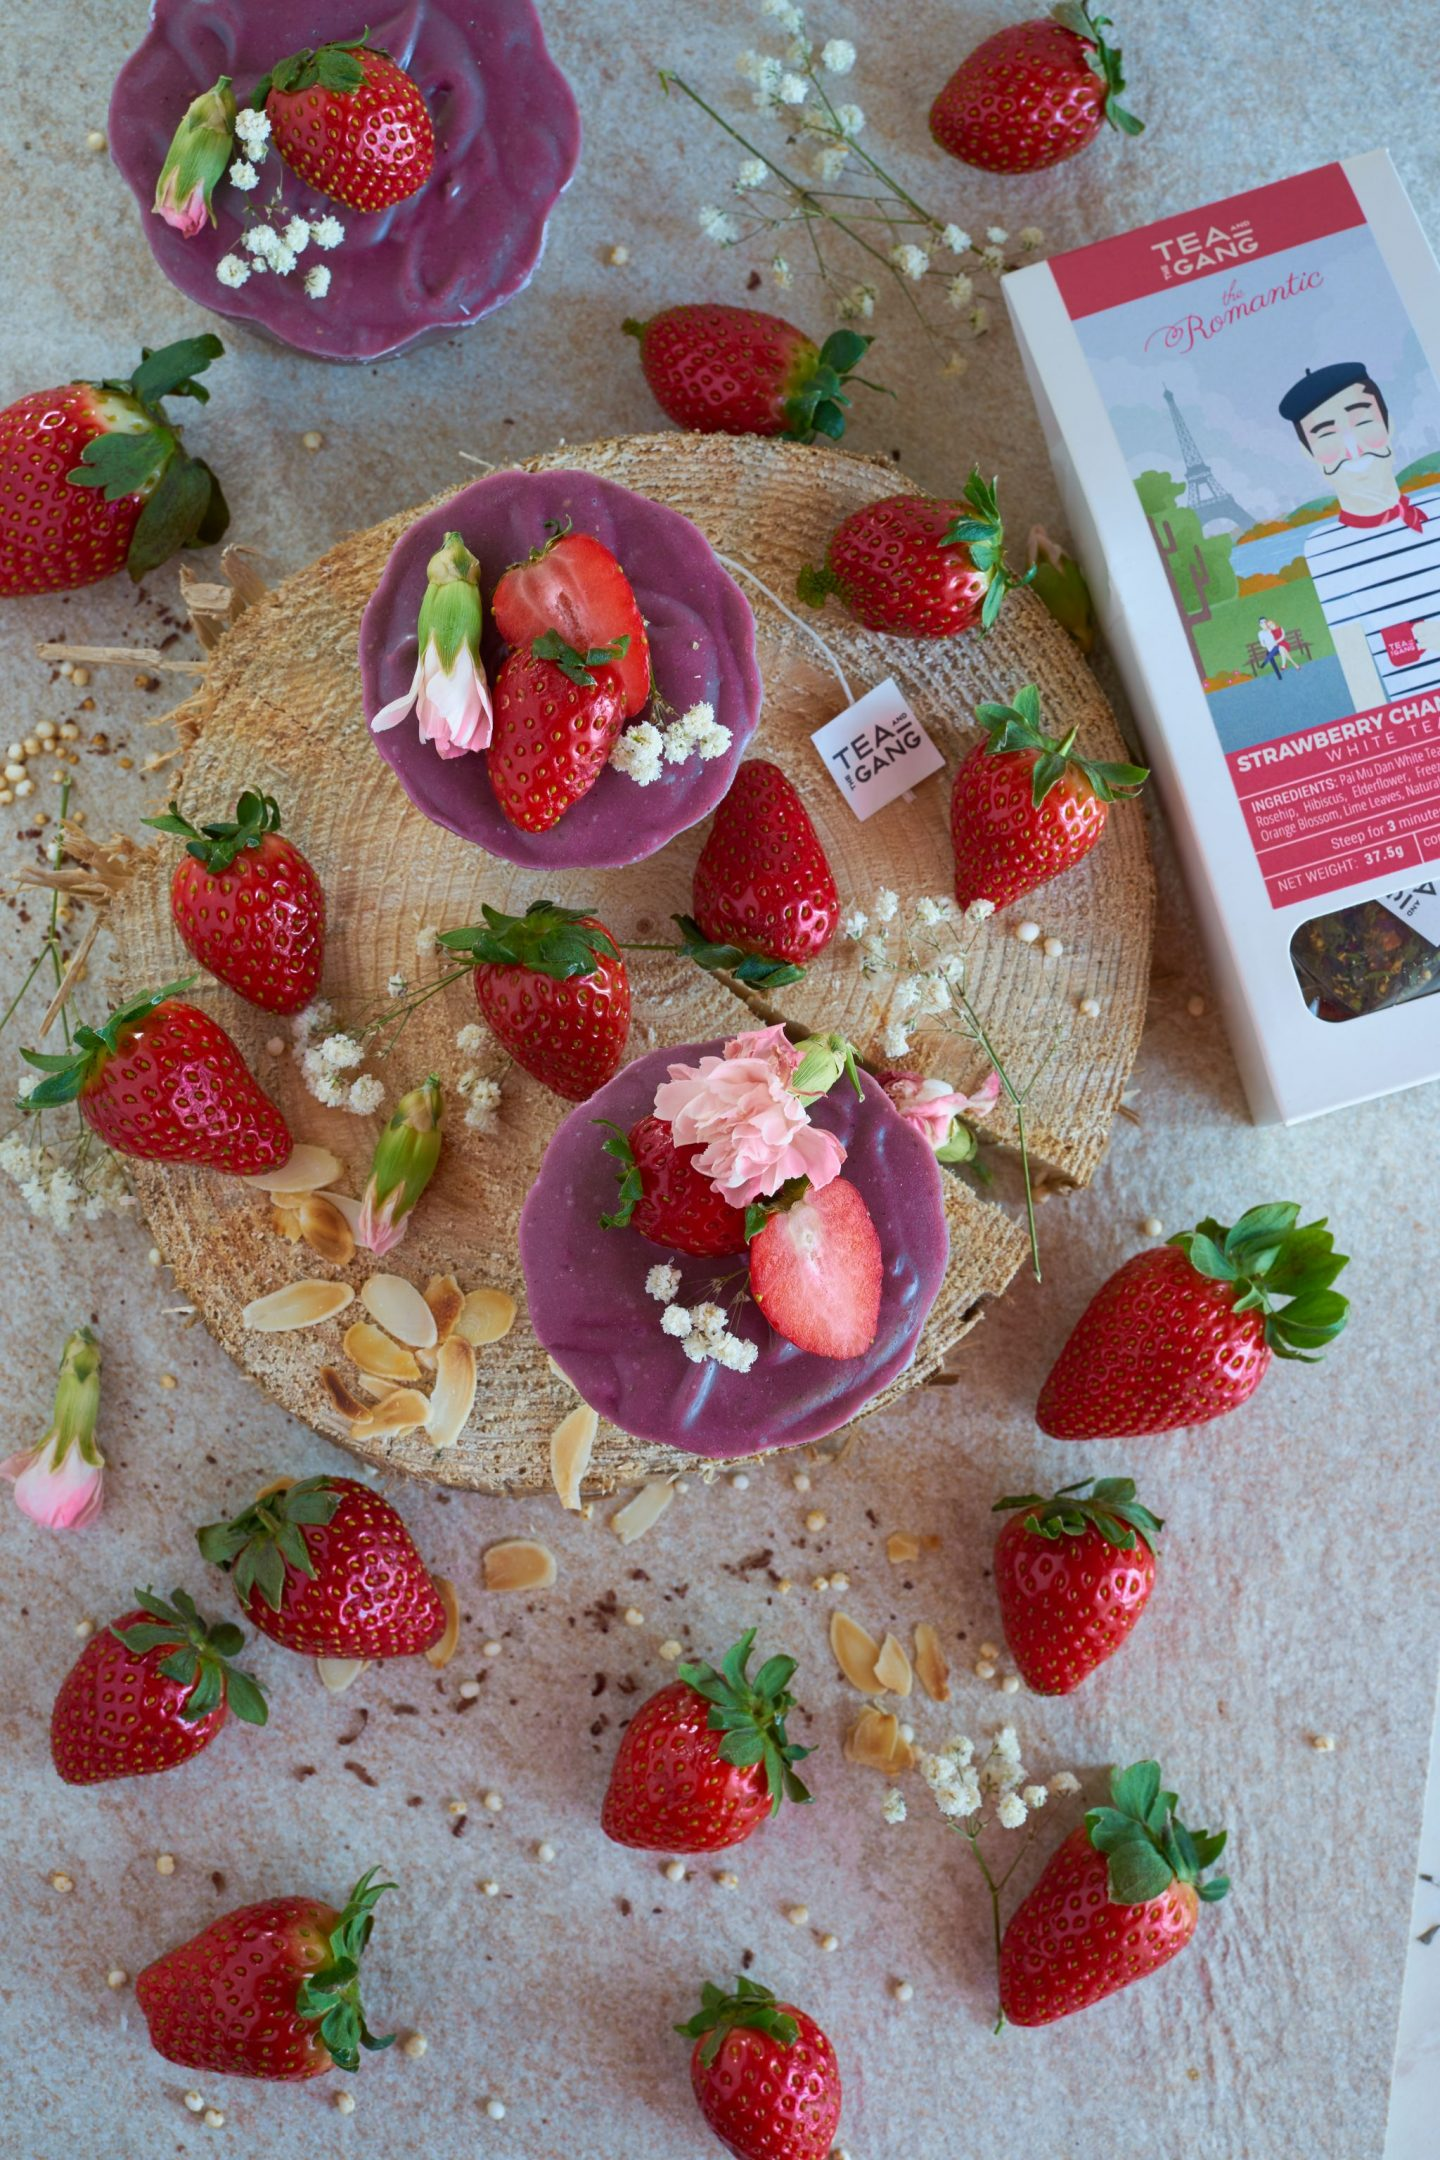 Strawberry-Champagner Raw Törtchen